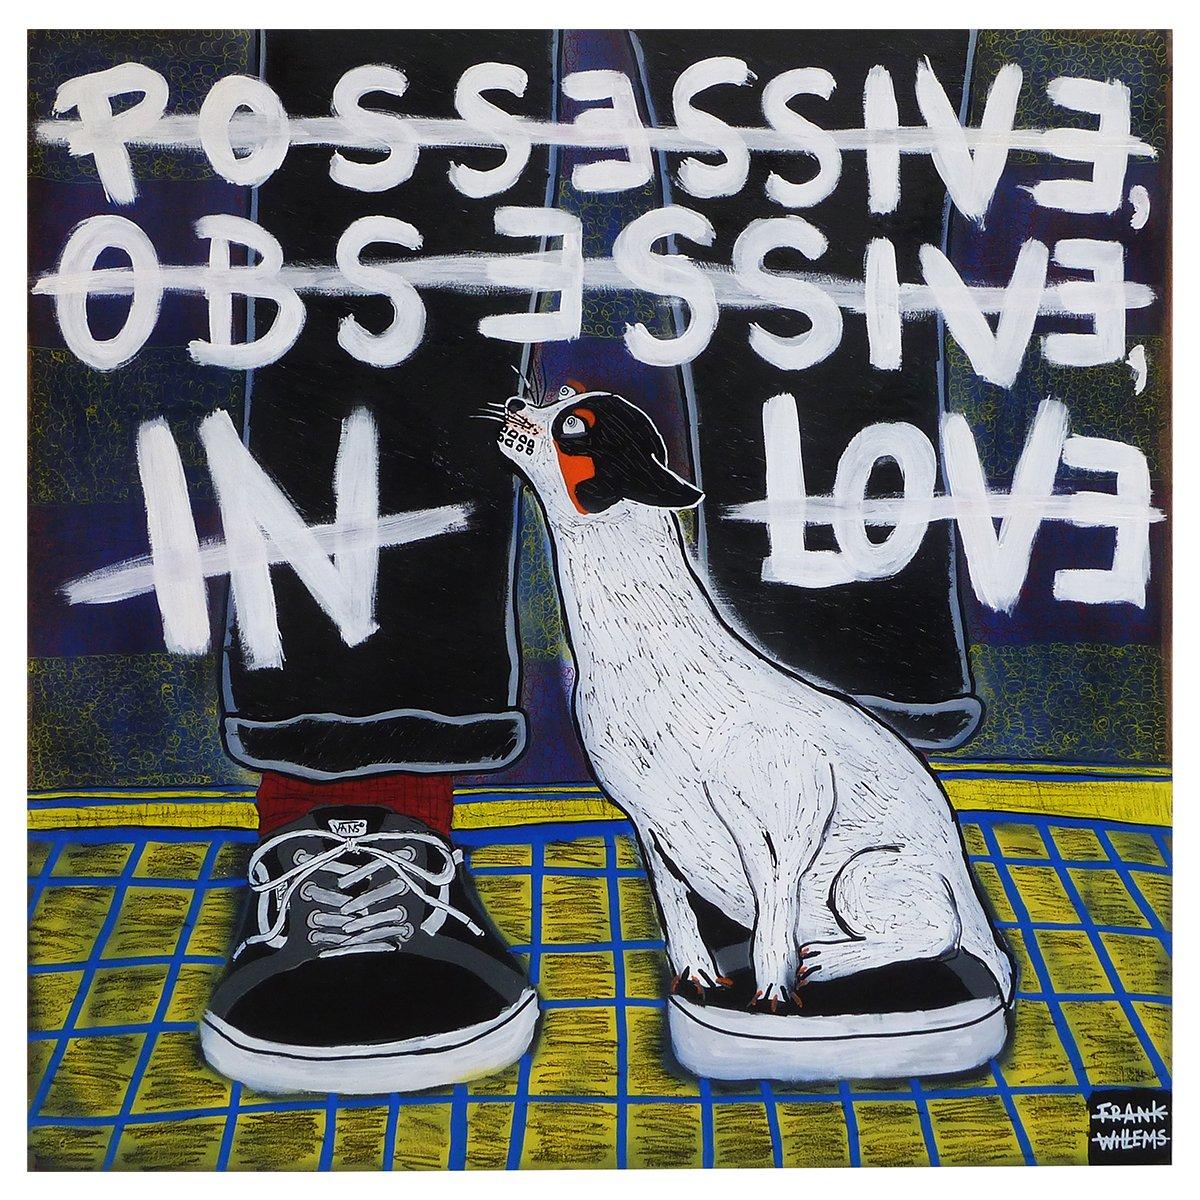 POSSESSIVE, OBSESSIVE, IN LOVE - Frank Willems